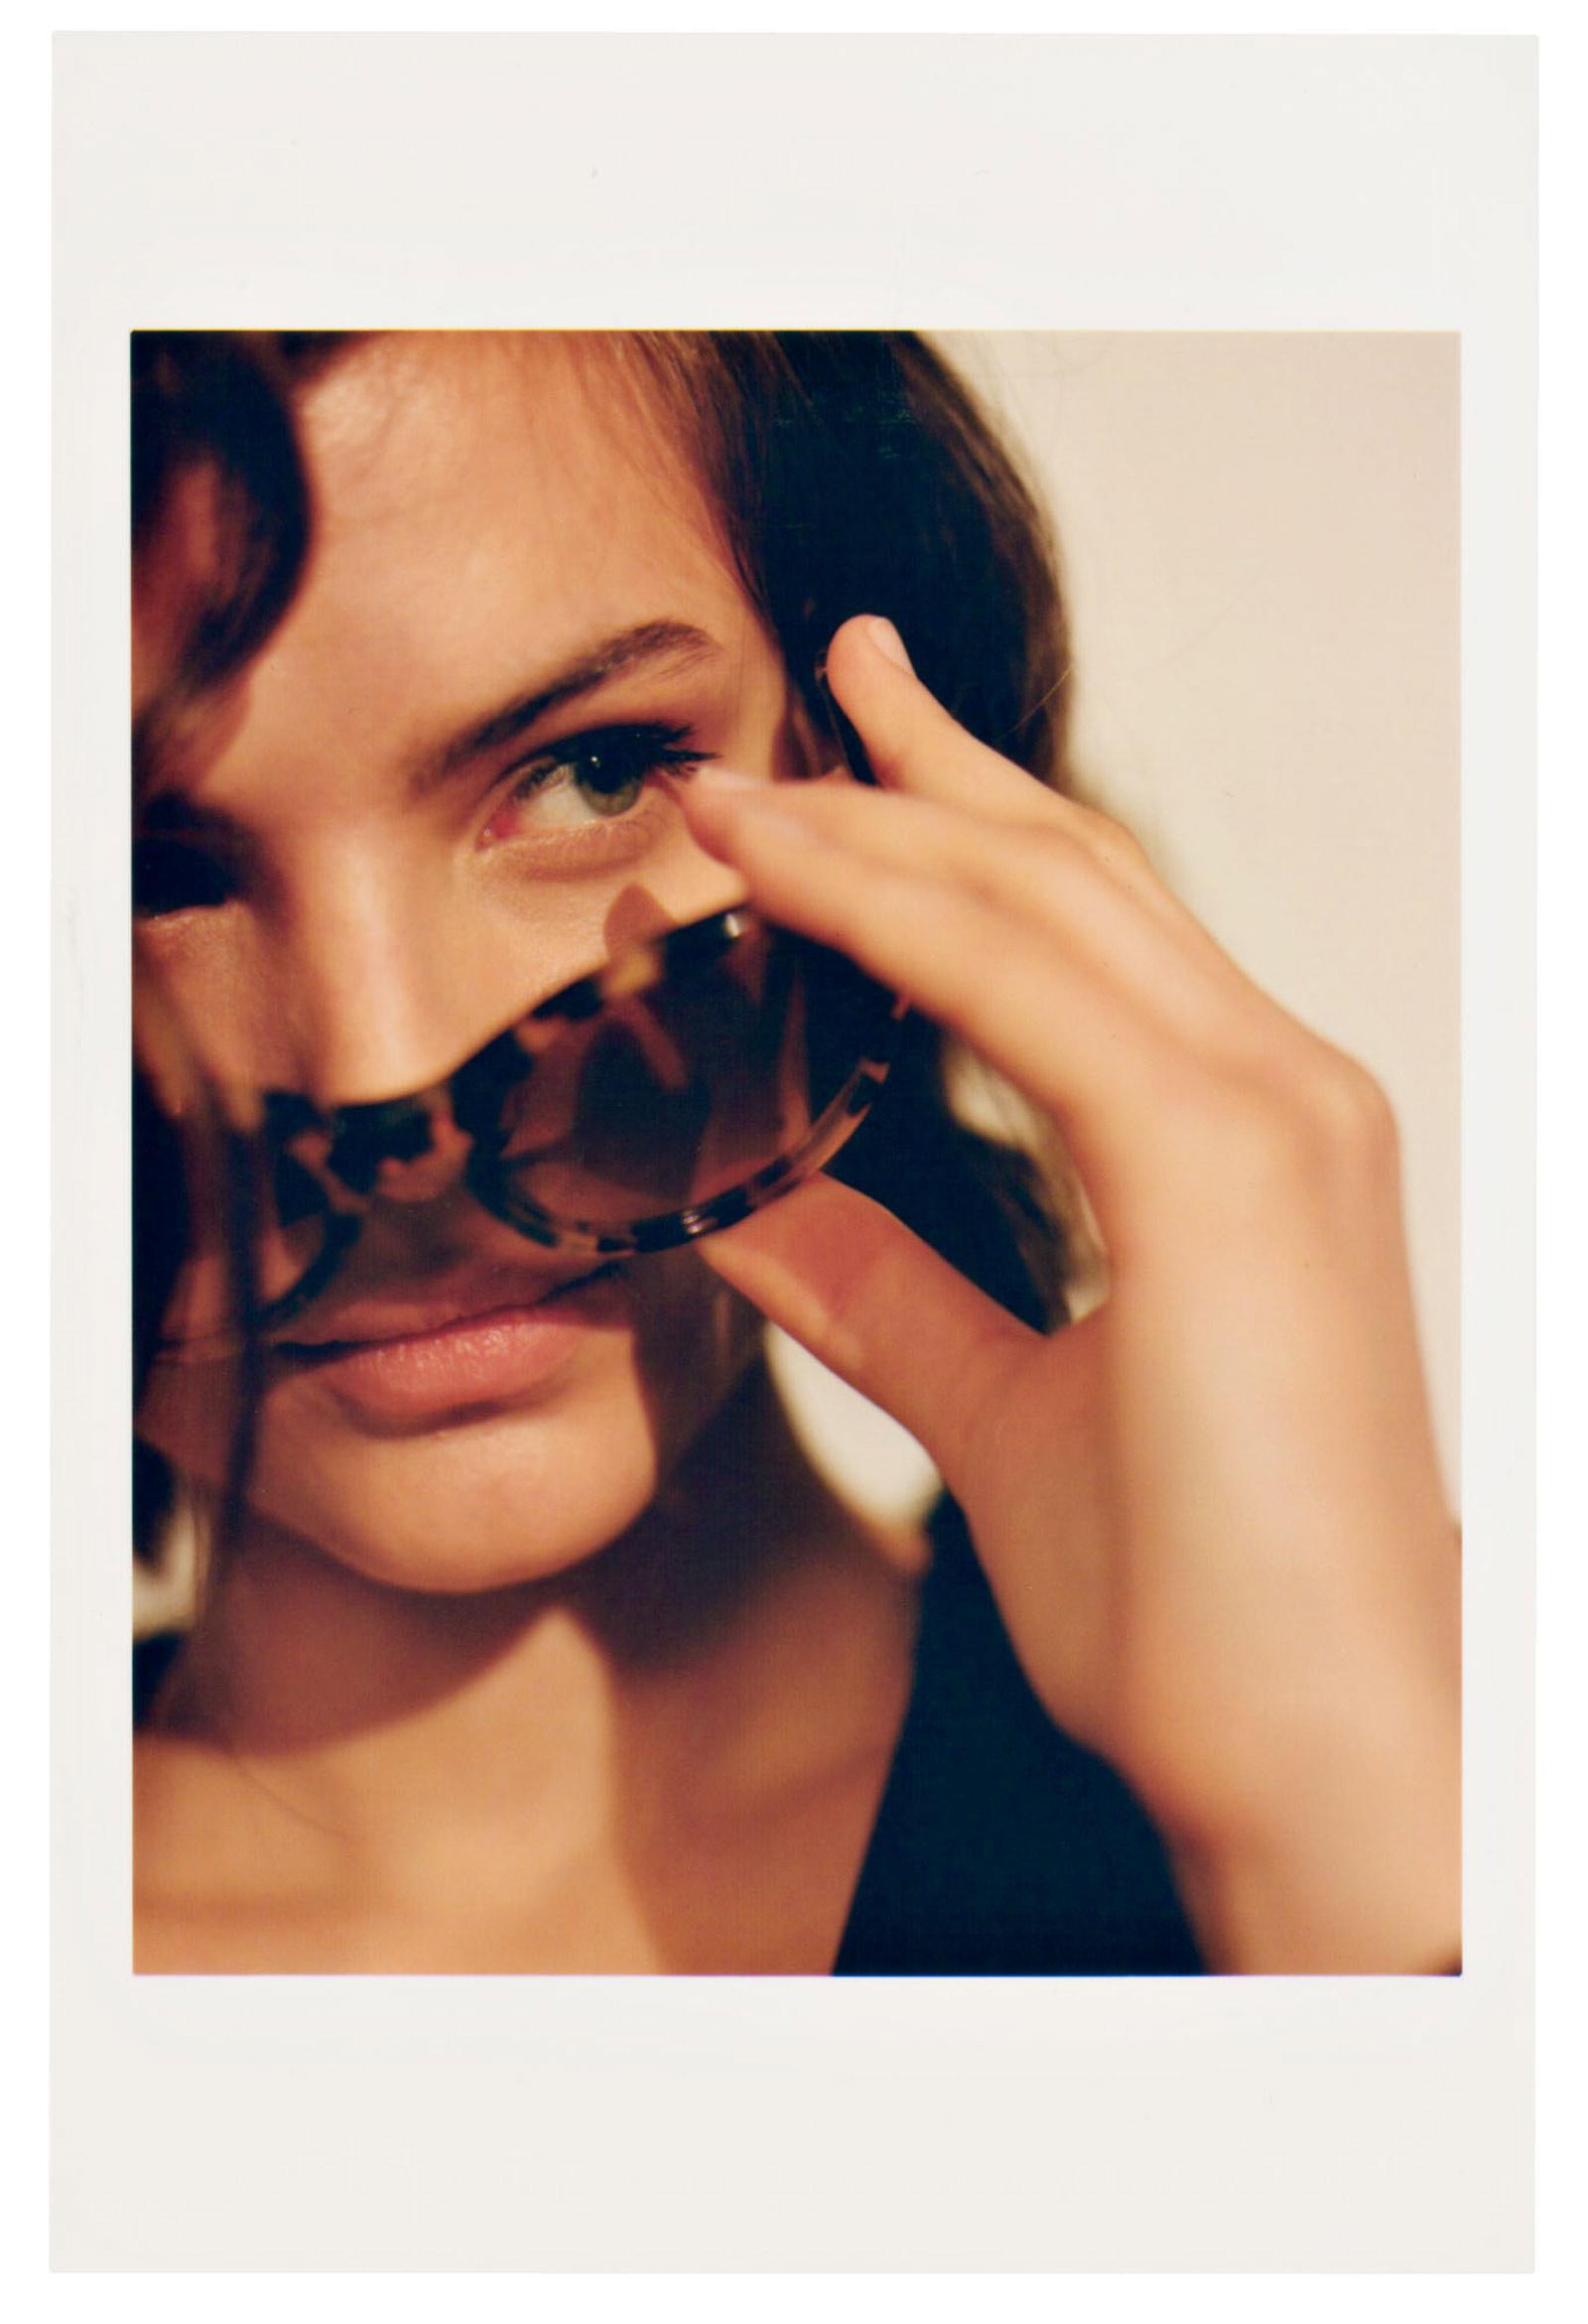 Emilia_Vuciniv_Models_dot_8_web-1600_22.jpg